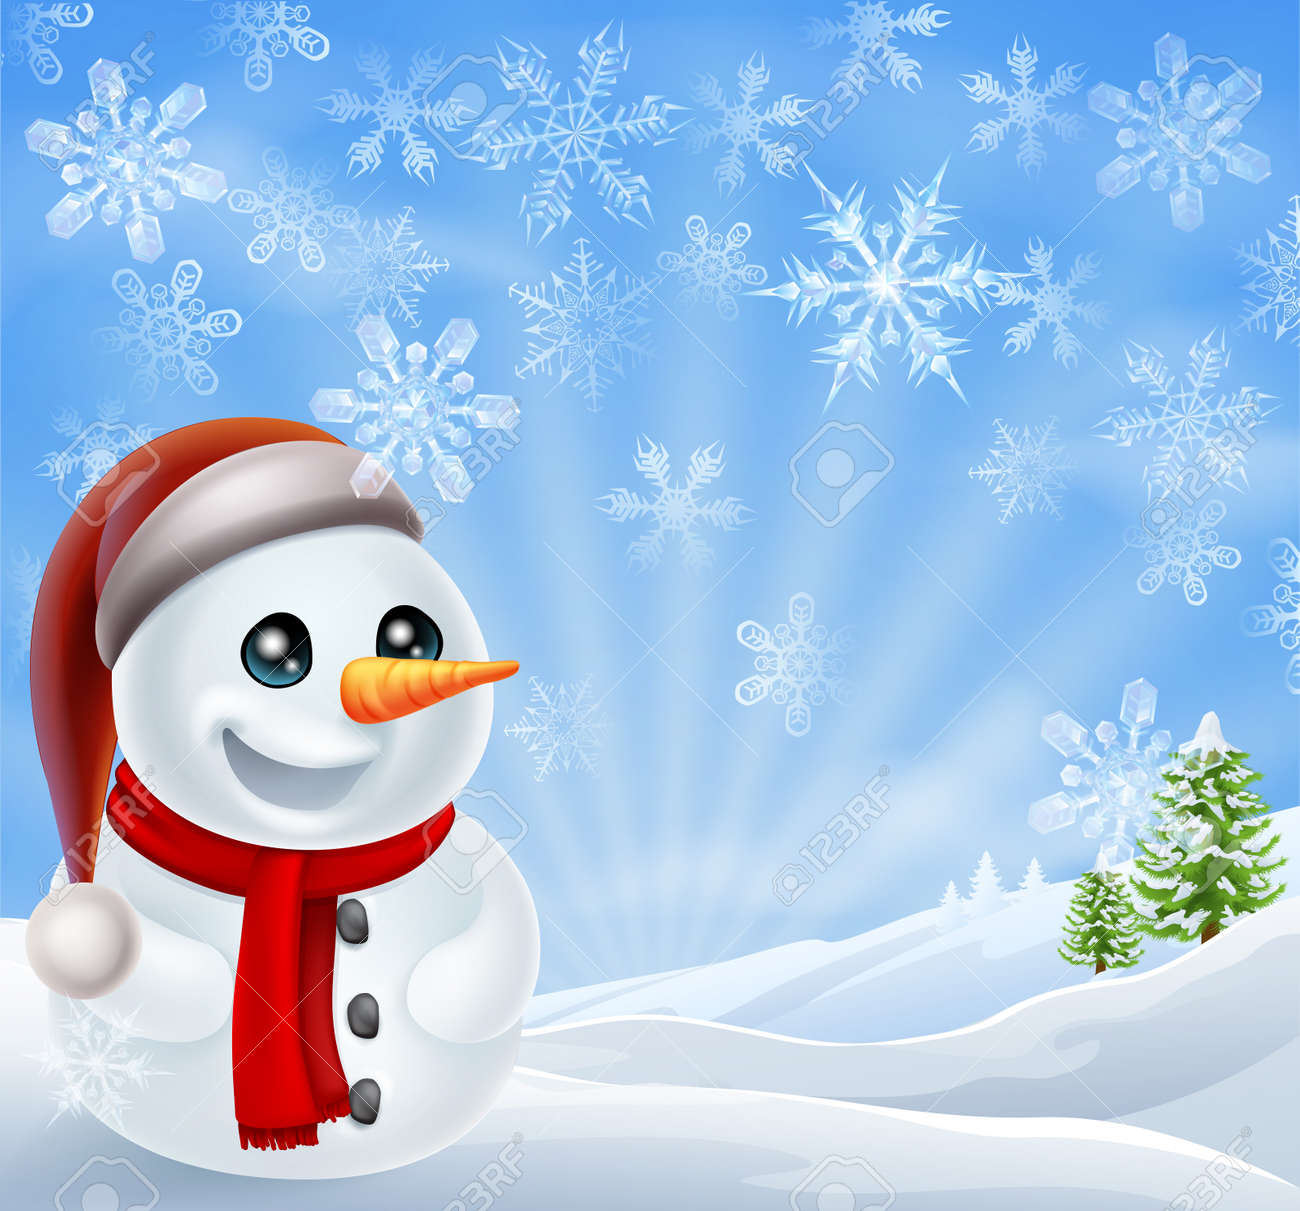 a cartoon snowman standing in a snow covered christmas landscape rh 123rf com screensaver winter scene cartoon cartoon winter scene pictures